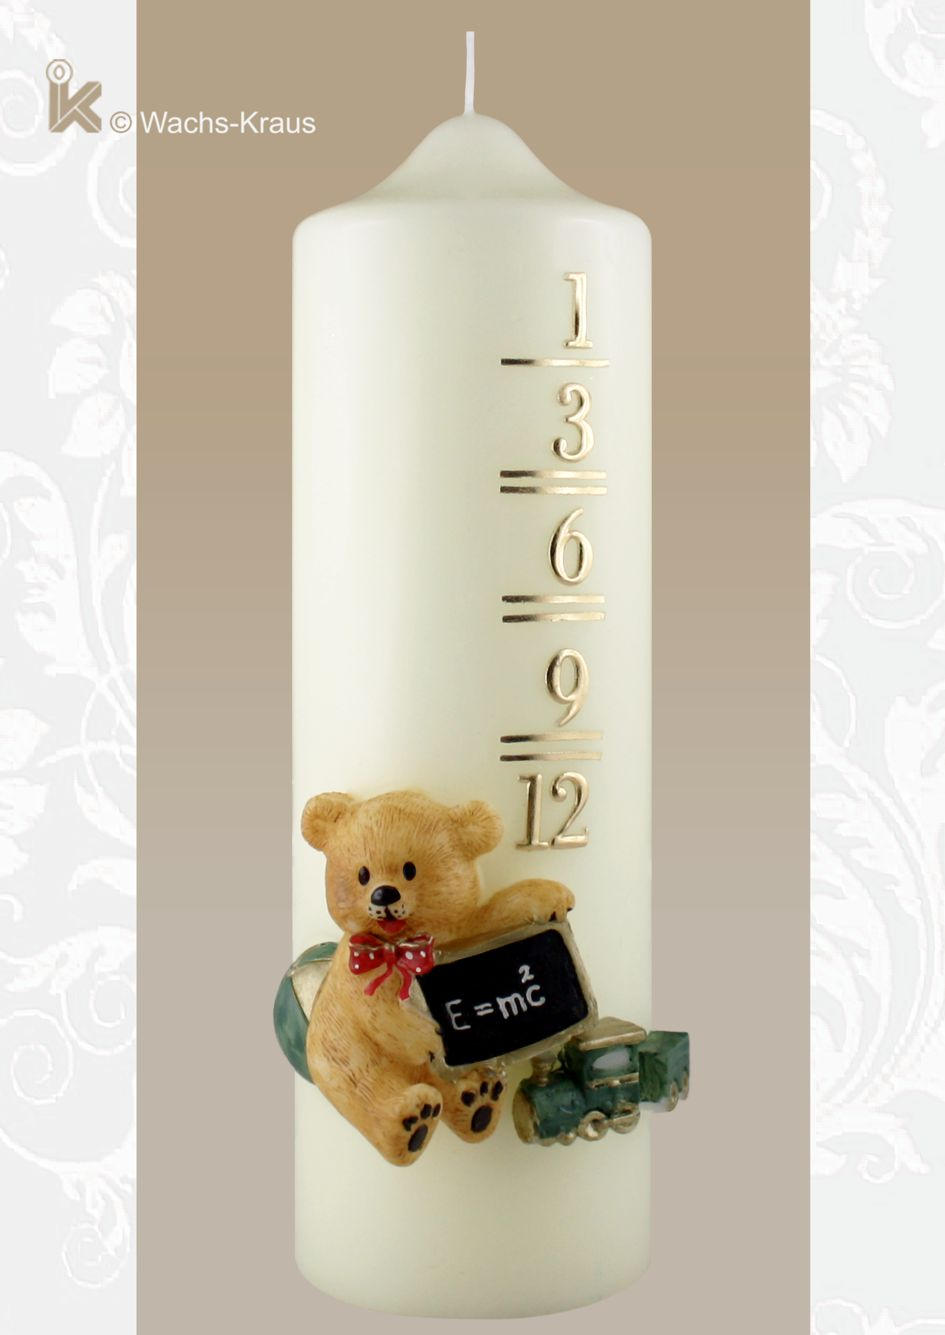 Wunderbar kindgerechtes Design. Kerze zum Geburtstag 1 - 12